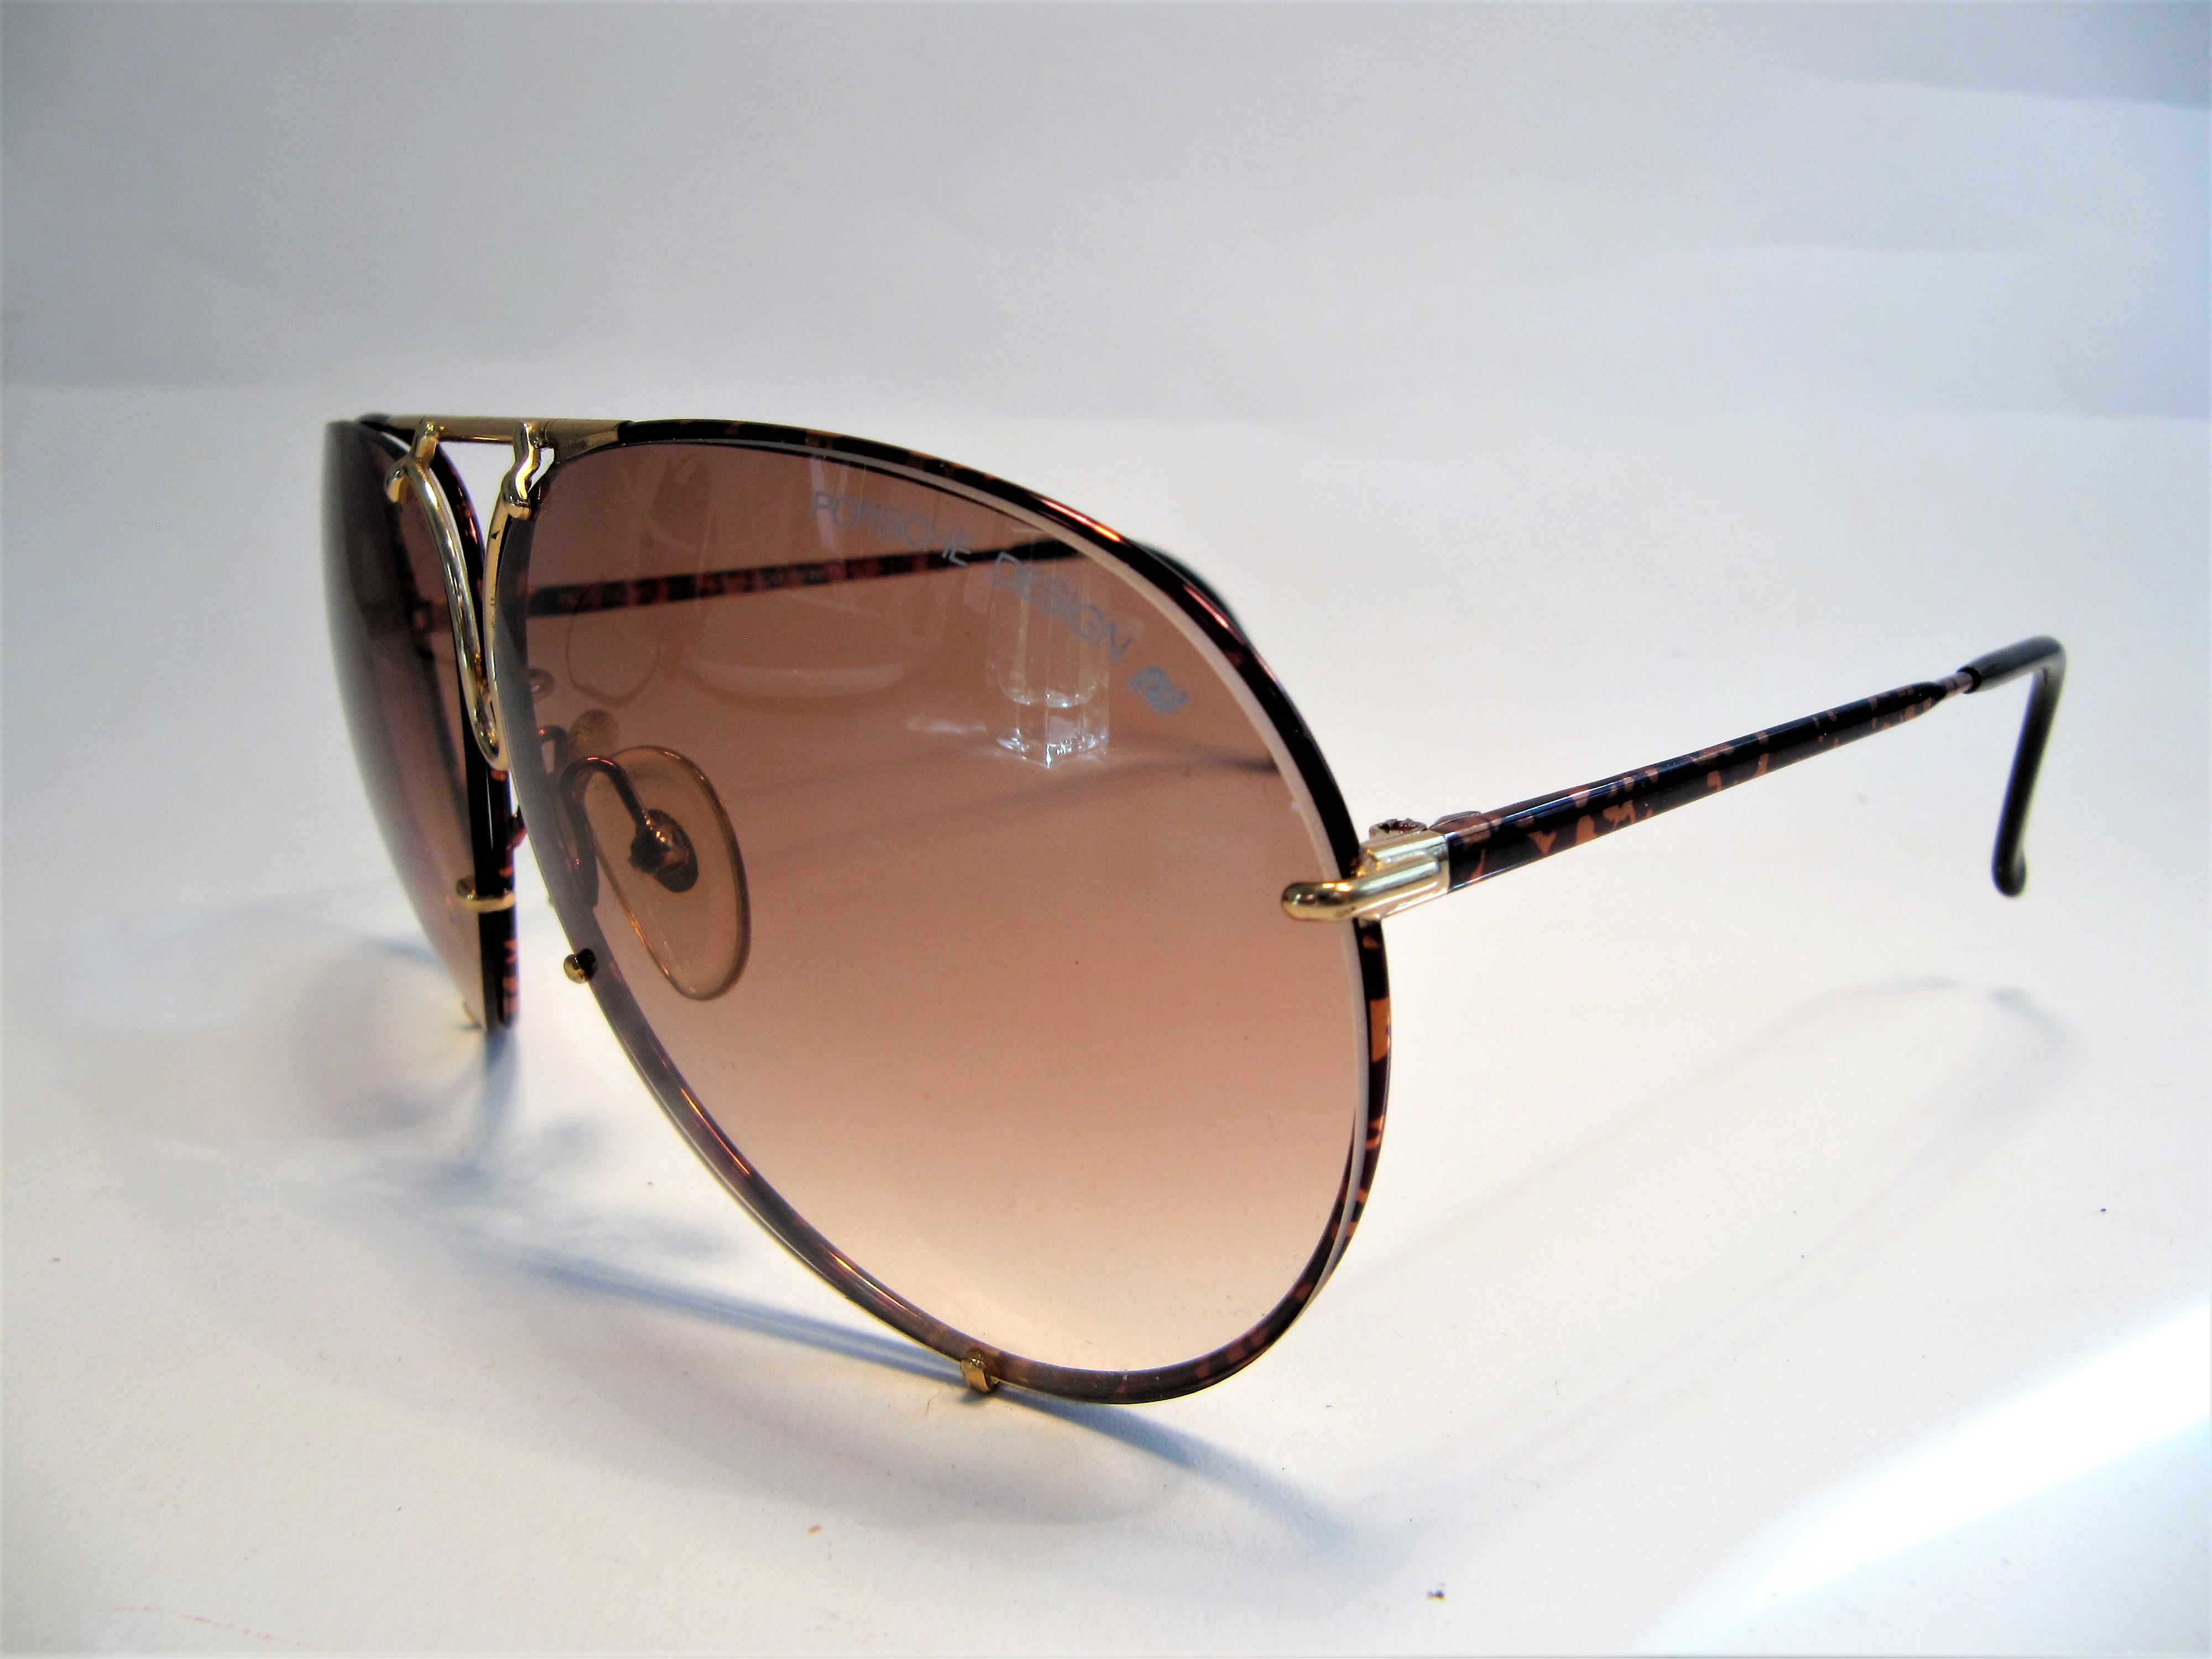 Porsche Design by Carrera 5623 tortoise shell 1980s vintage sunglasses made in Austria